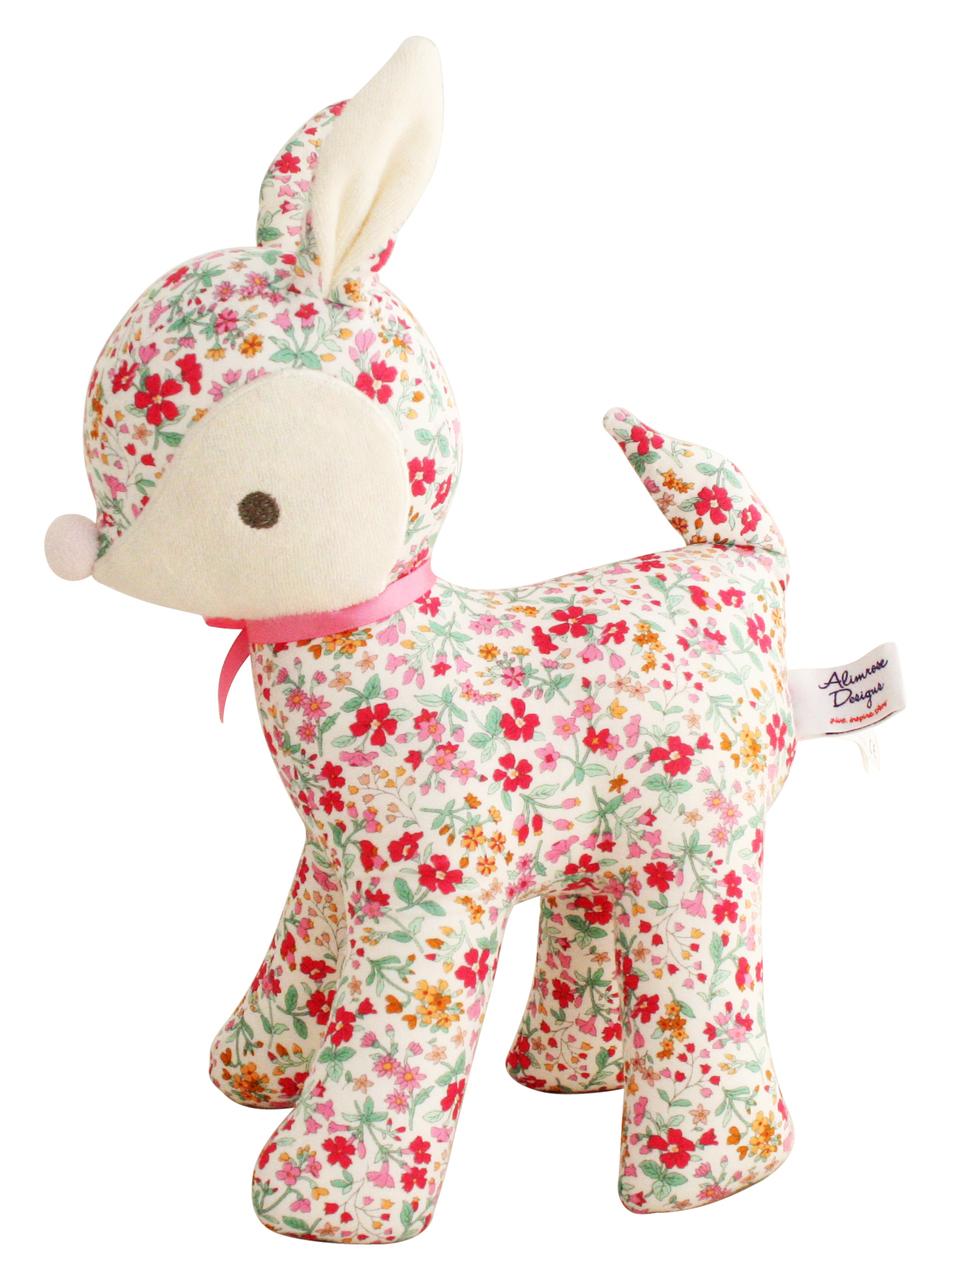 Alimrose Designs Toy Deer - Flower Bouquet